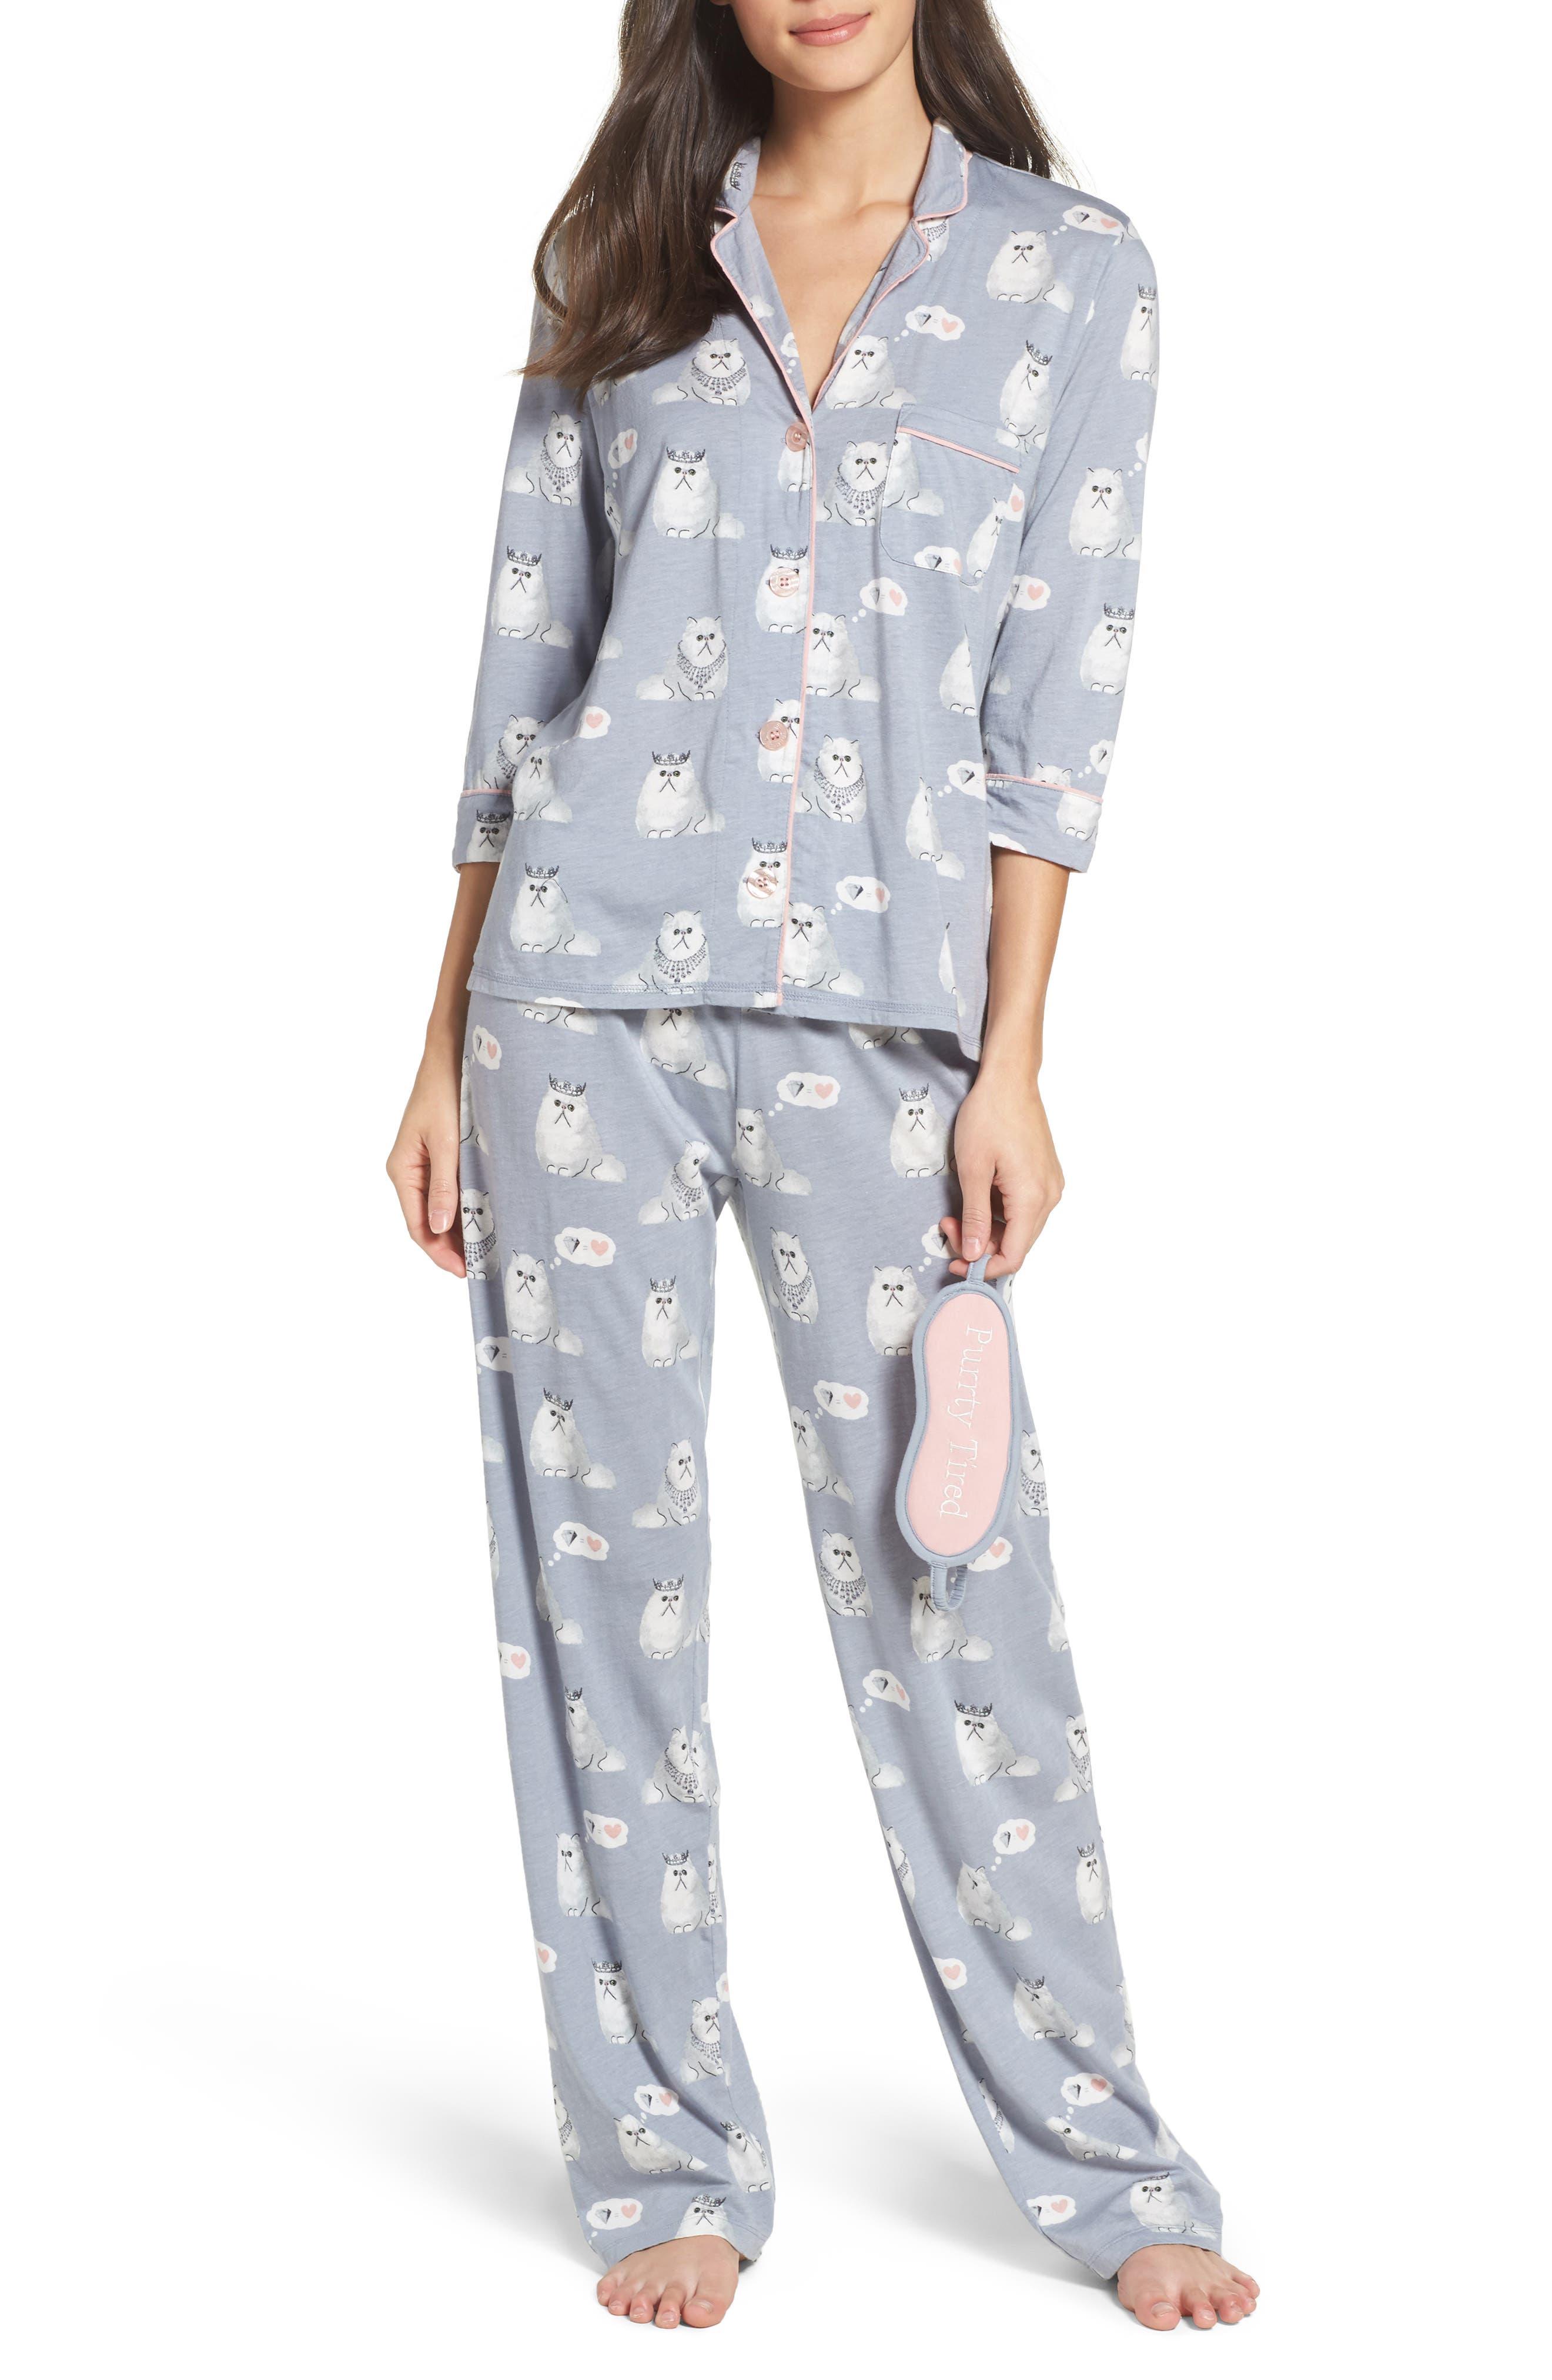 Main Image - PJ Salvage Playful Print Pajamas & Eye Mask